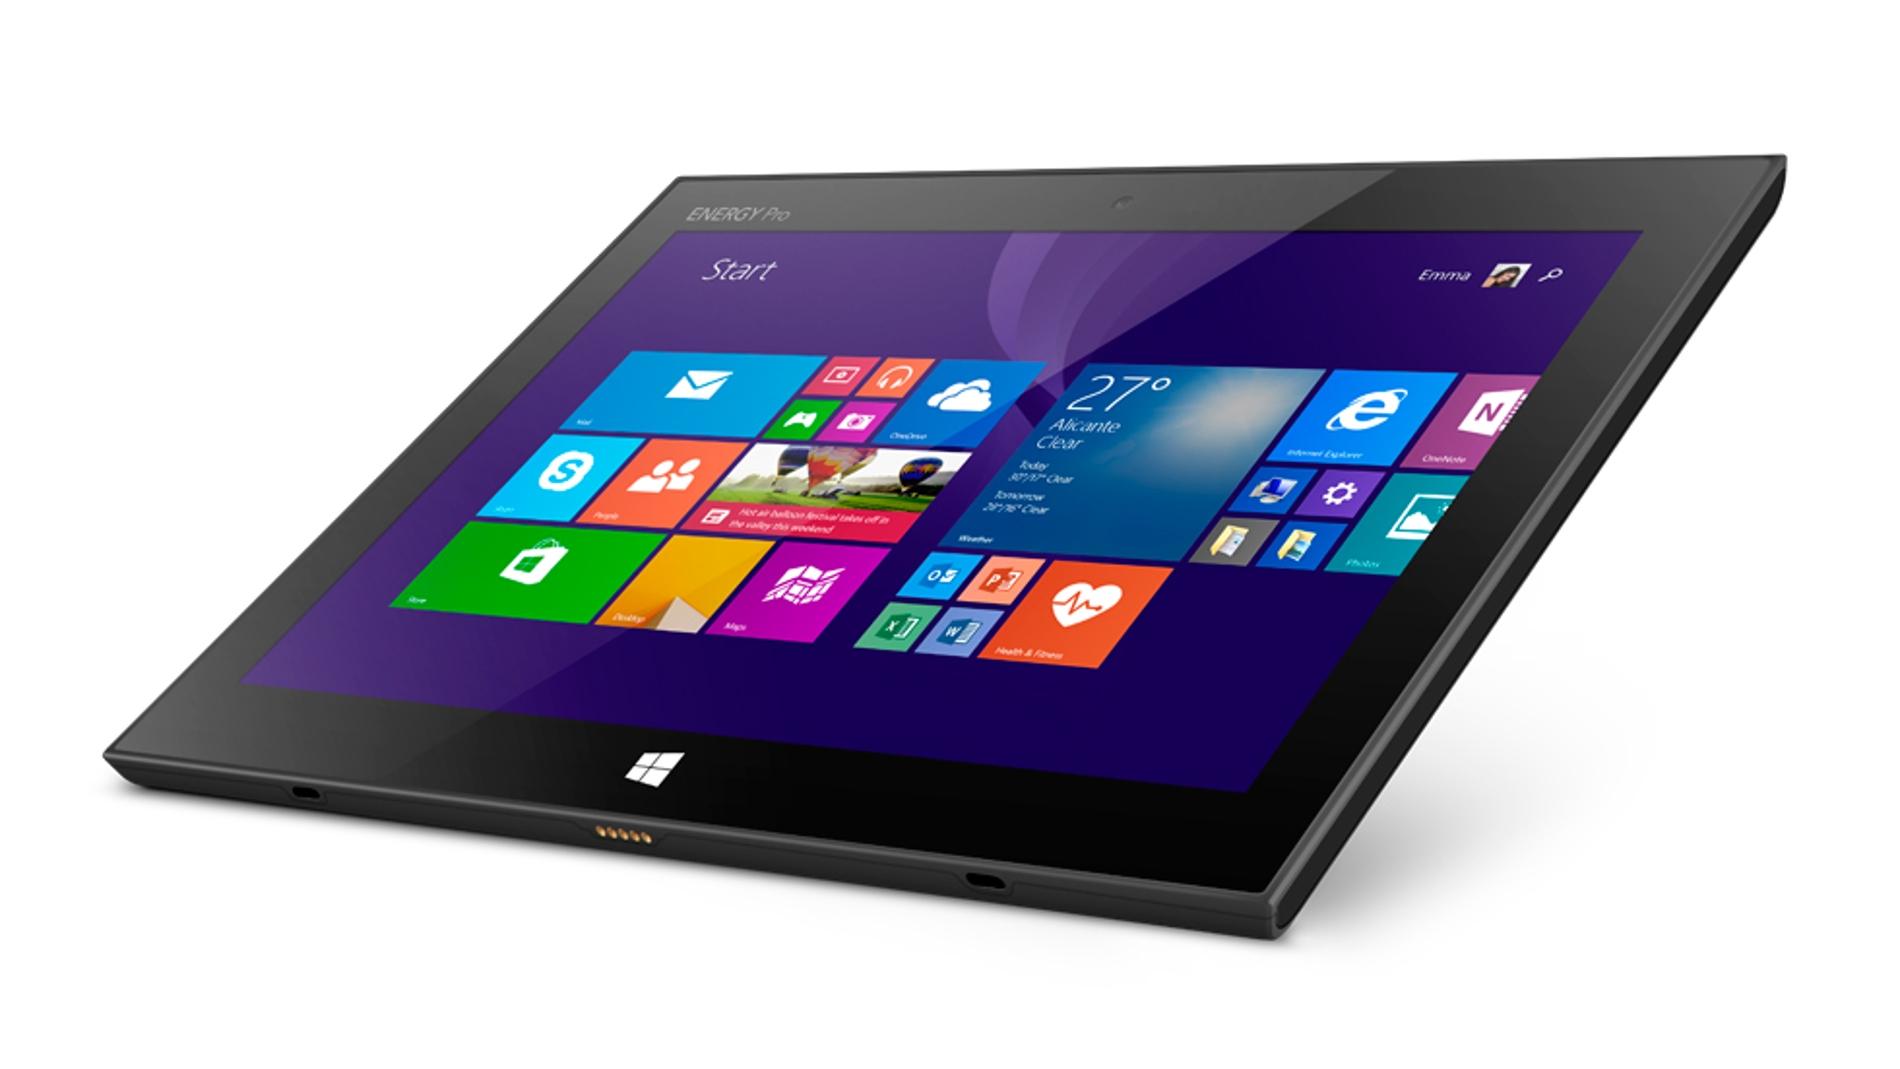 Tablet Pro 9